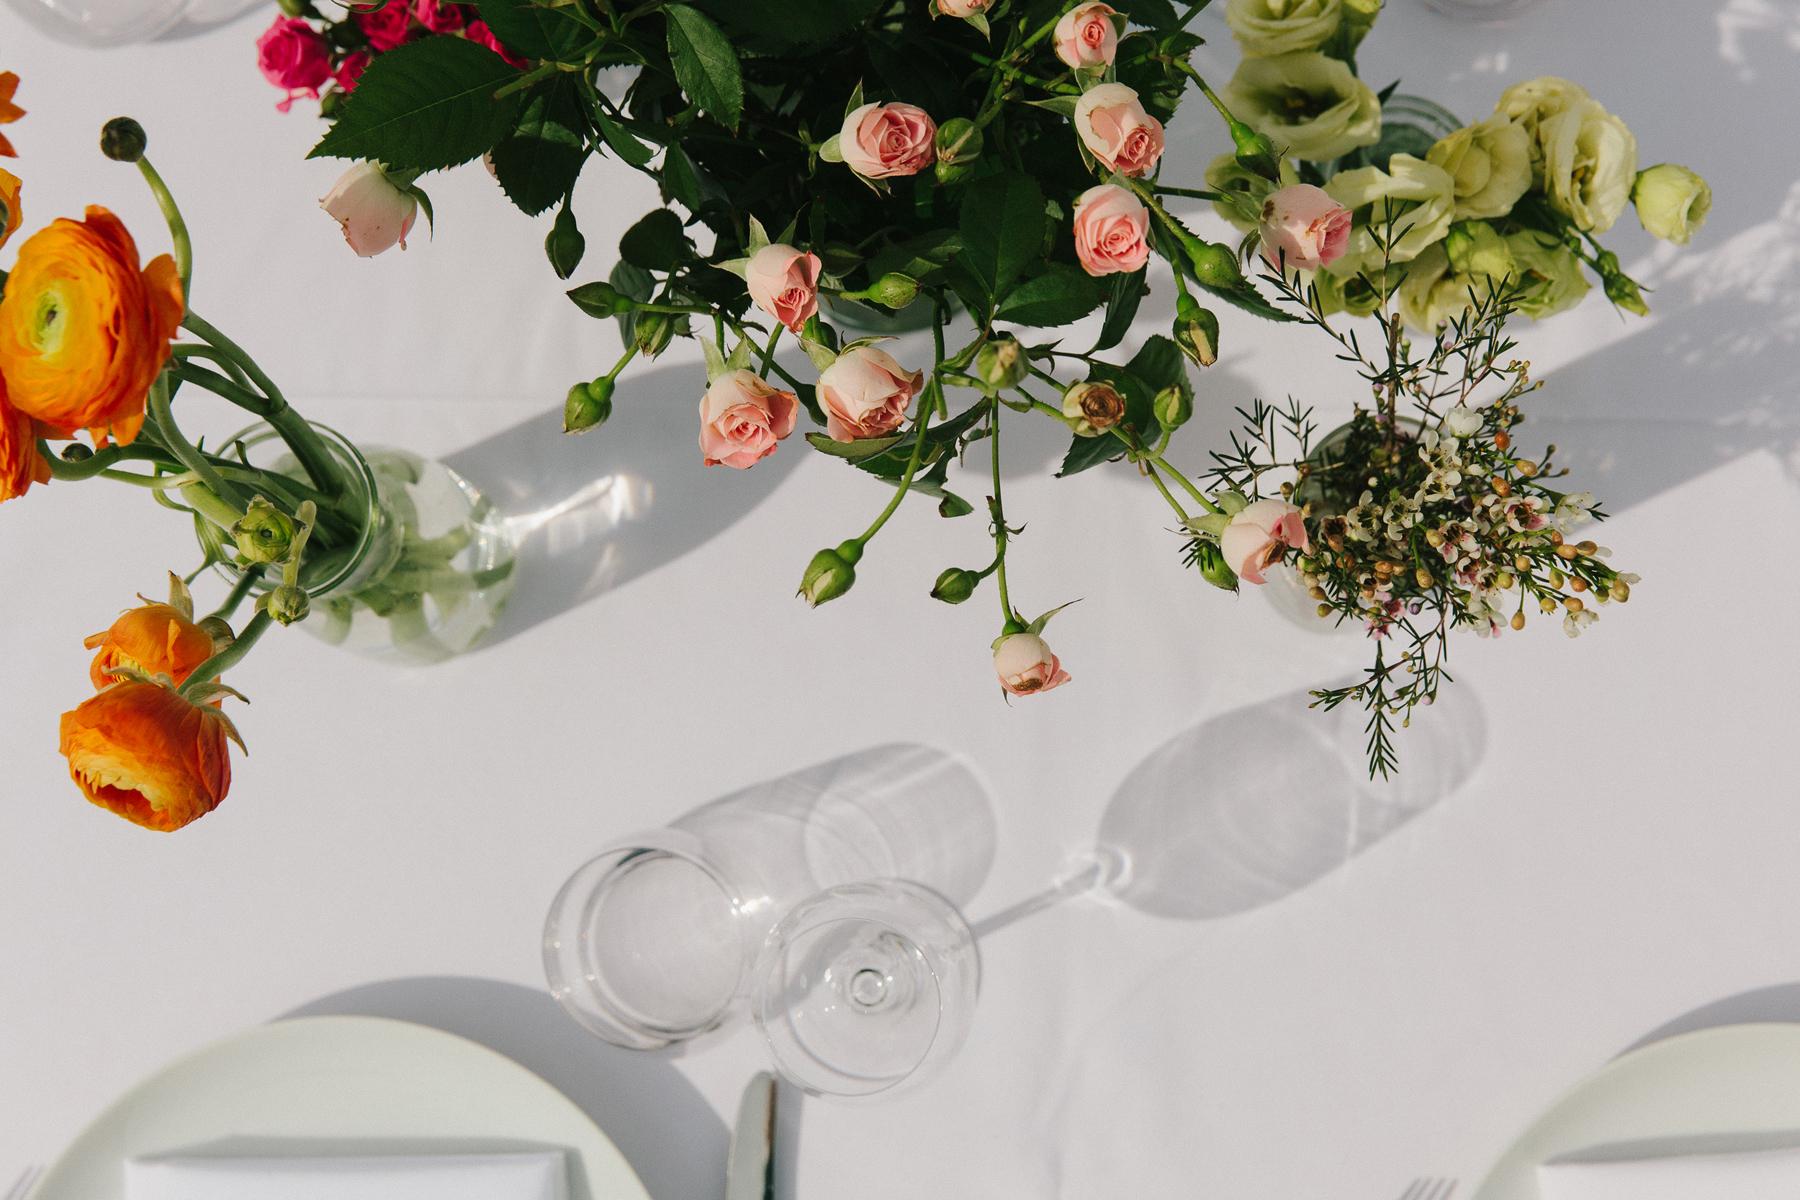 UBC-Botanical-Garden-Wedding-AD-073.jpg